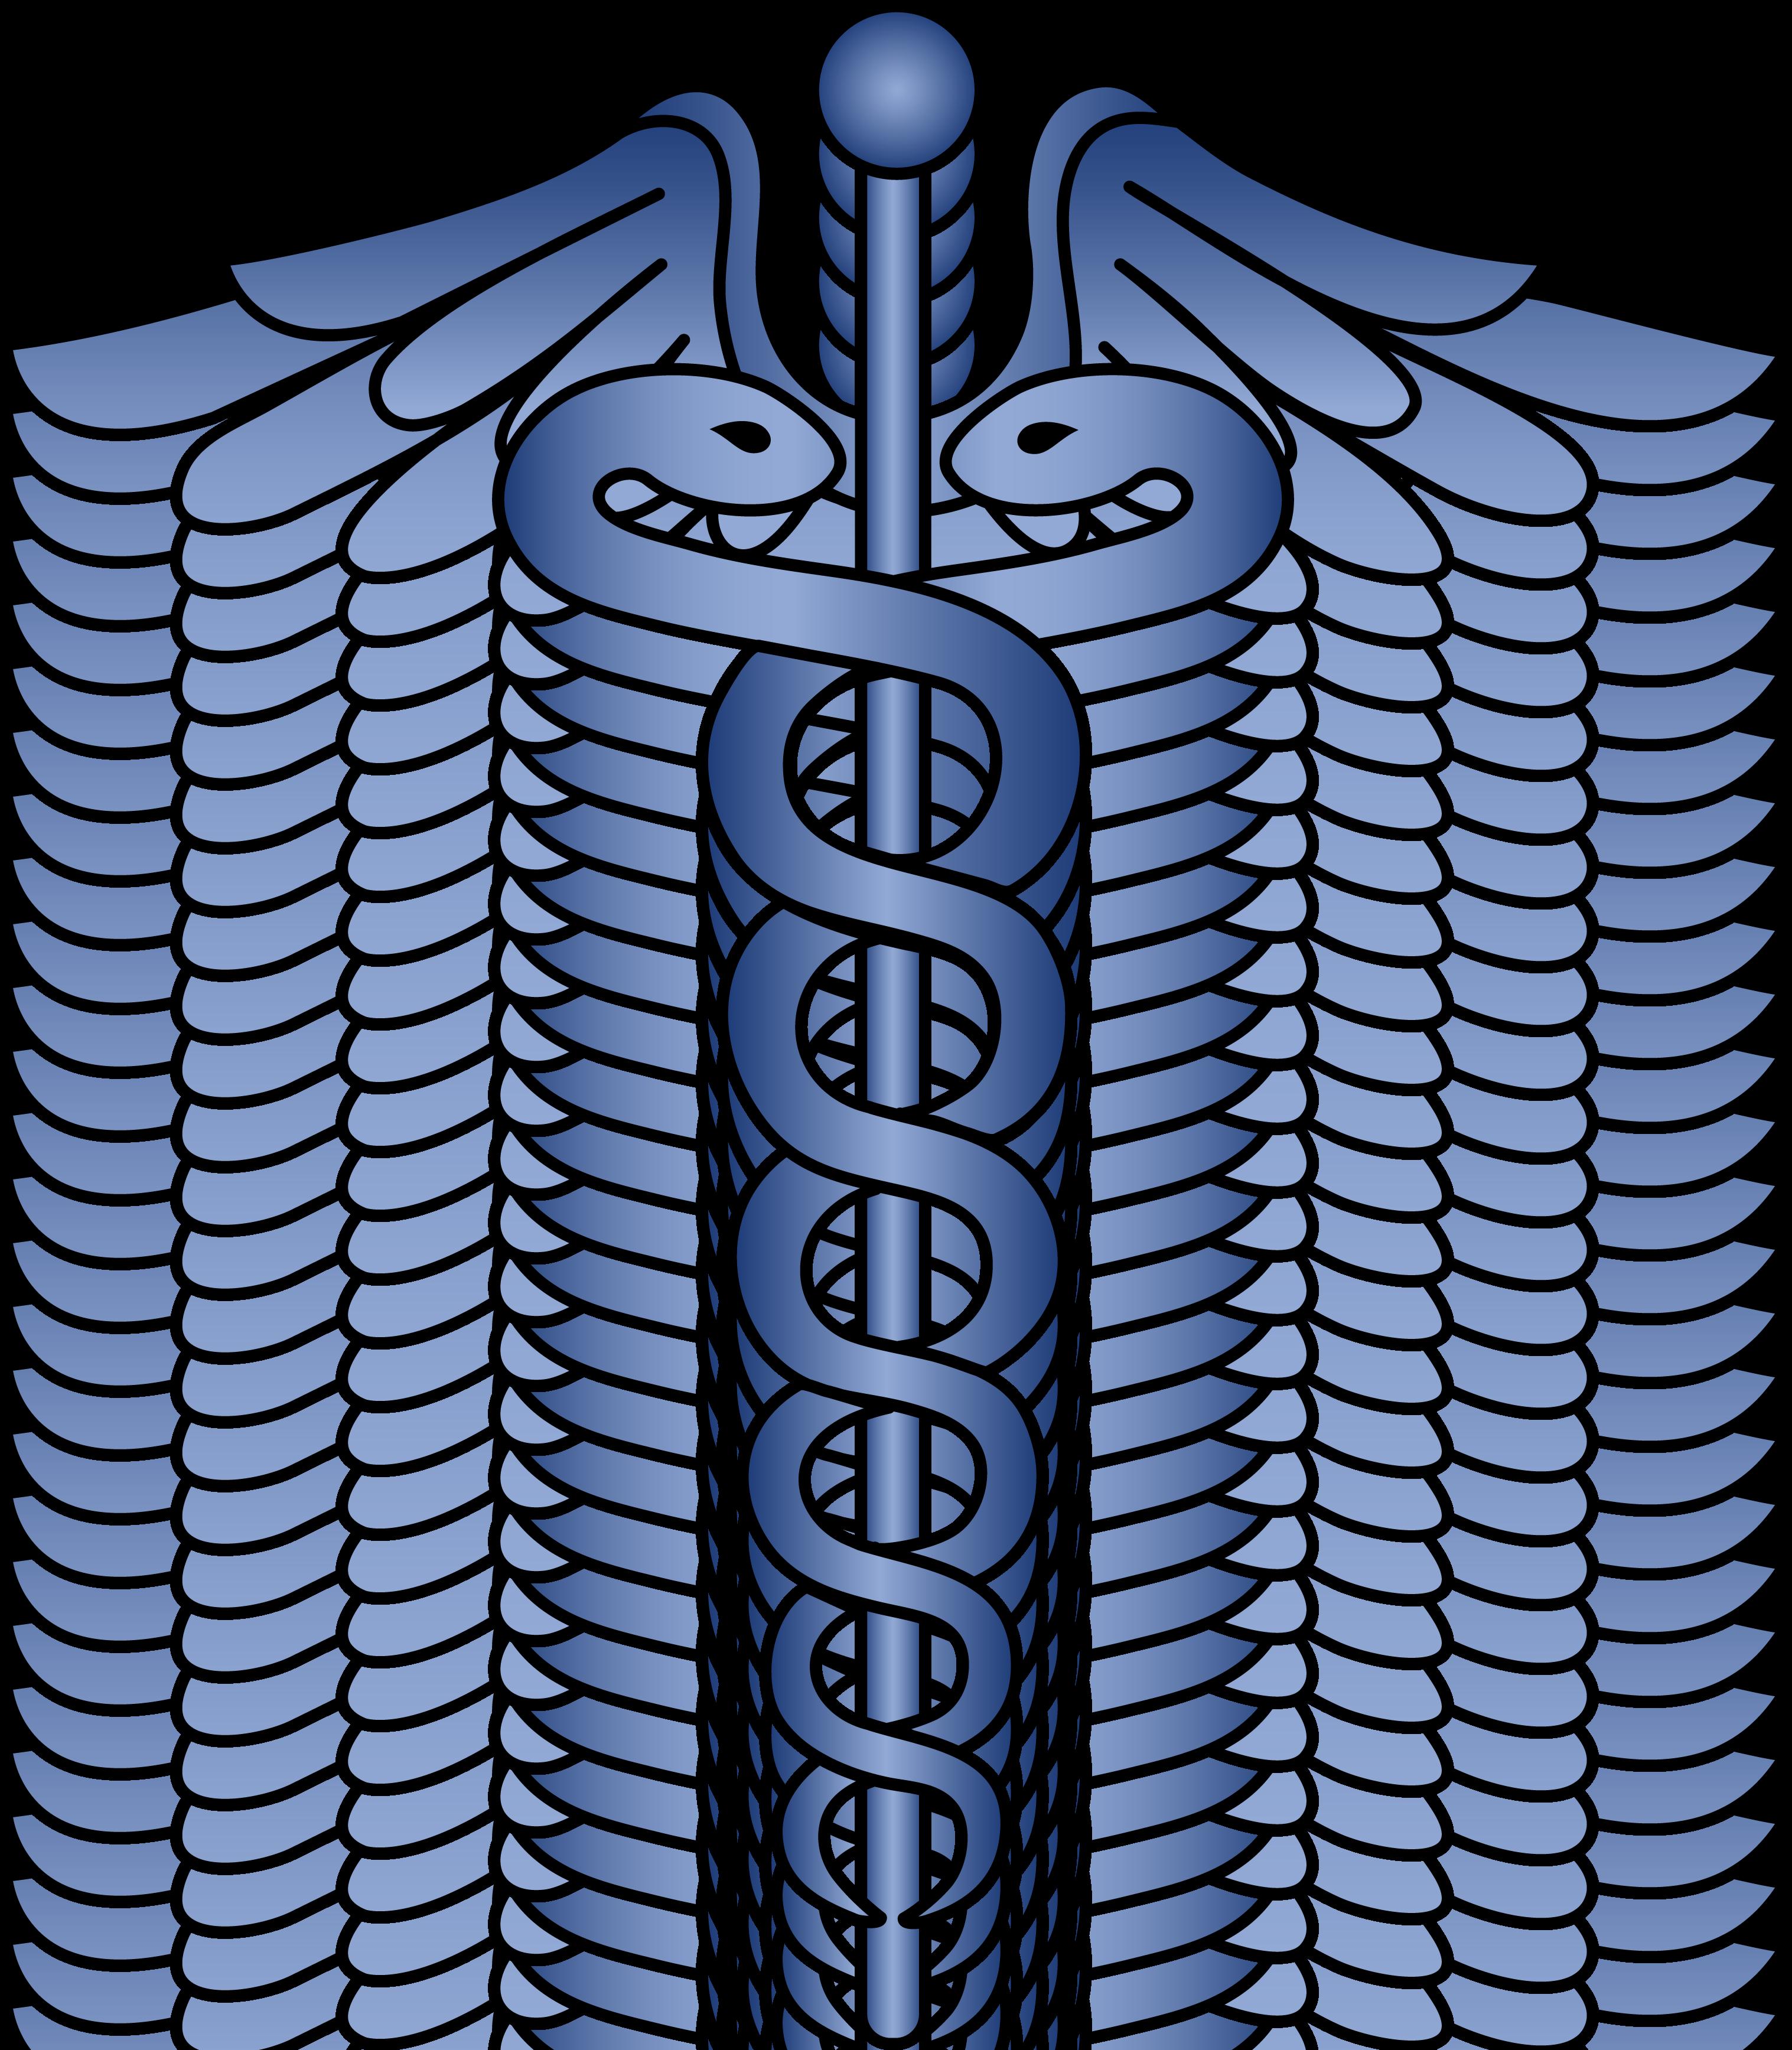 Type 1 Diabetes Symbol Google Search Clip Art Symbols Free Clip Art